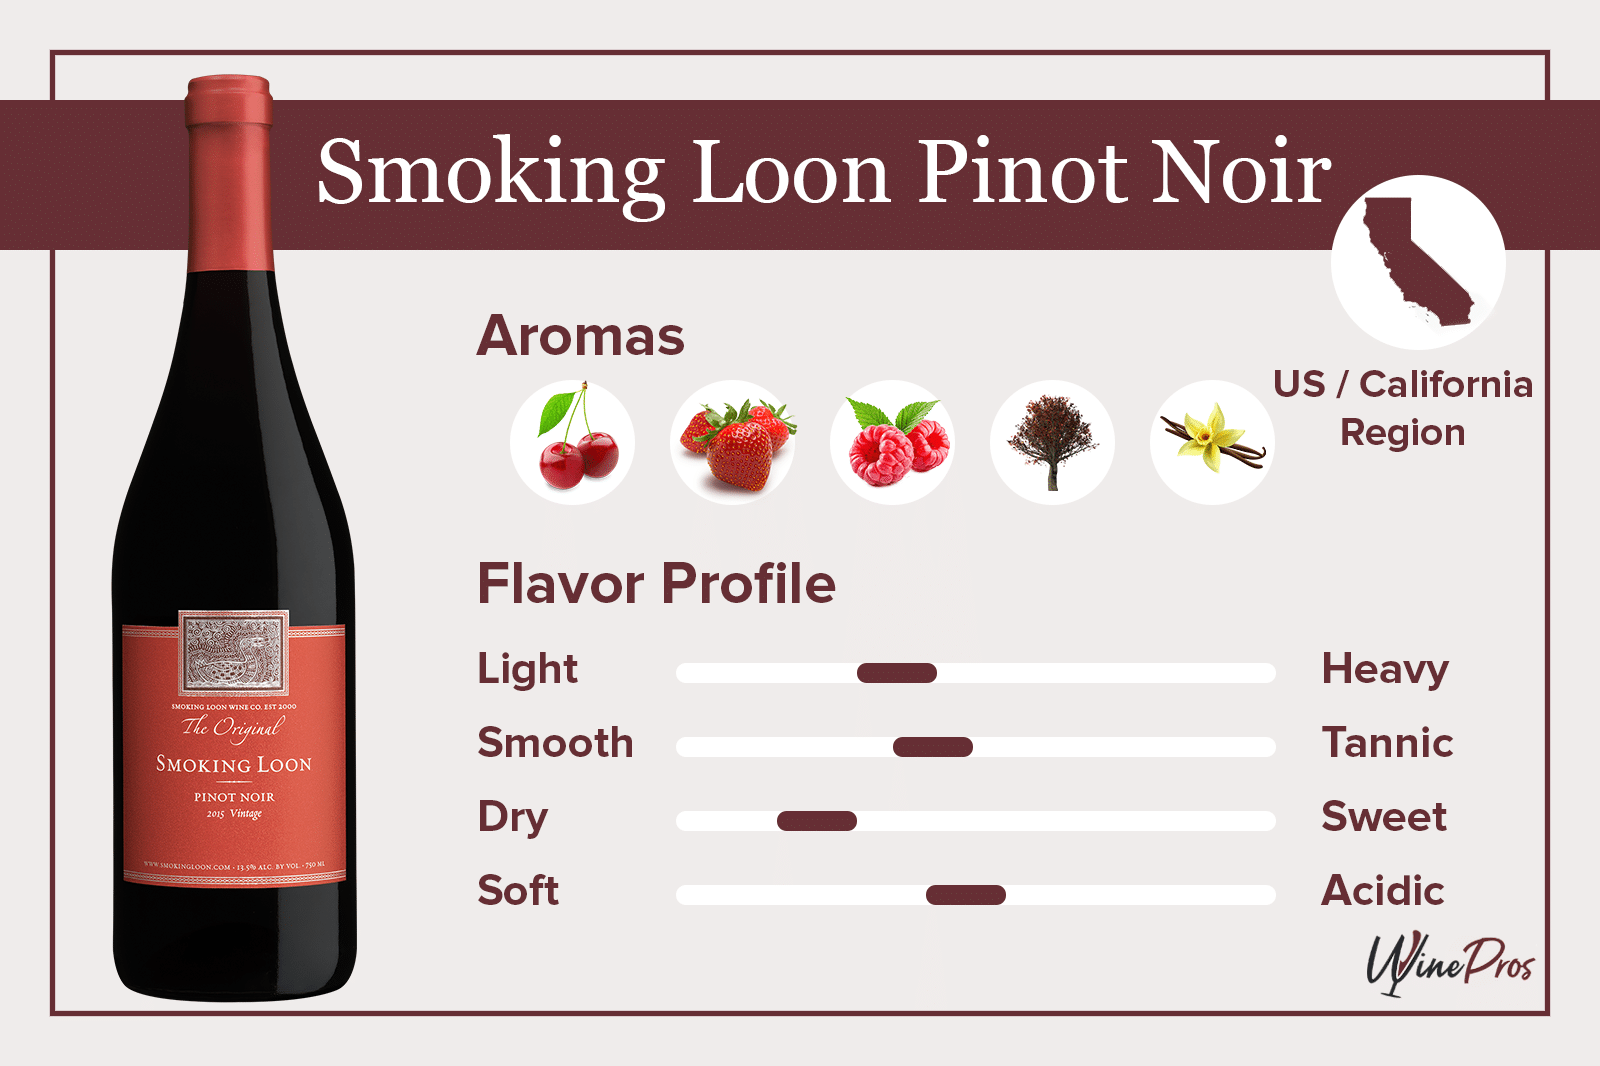 Smoking Loon Pinot Noir Featured